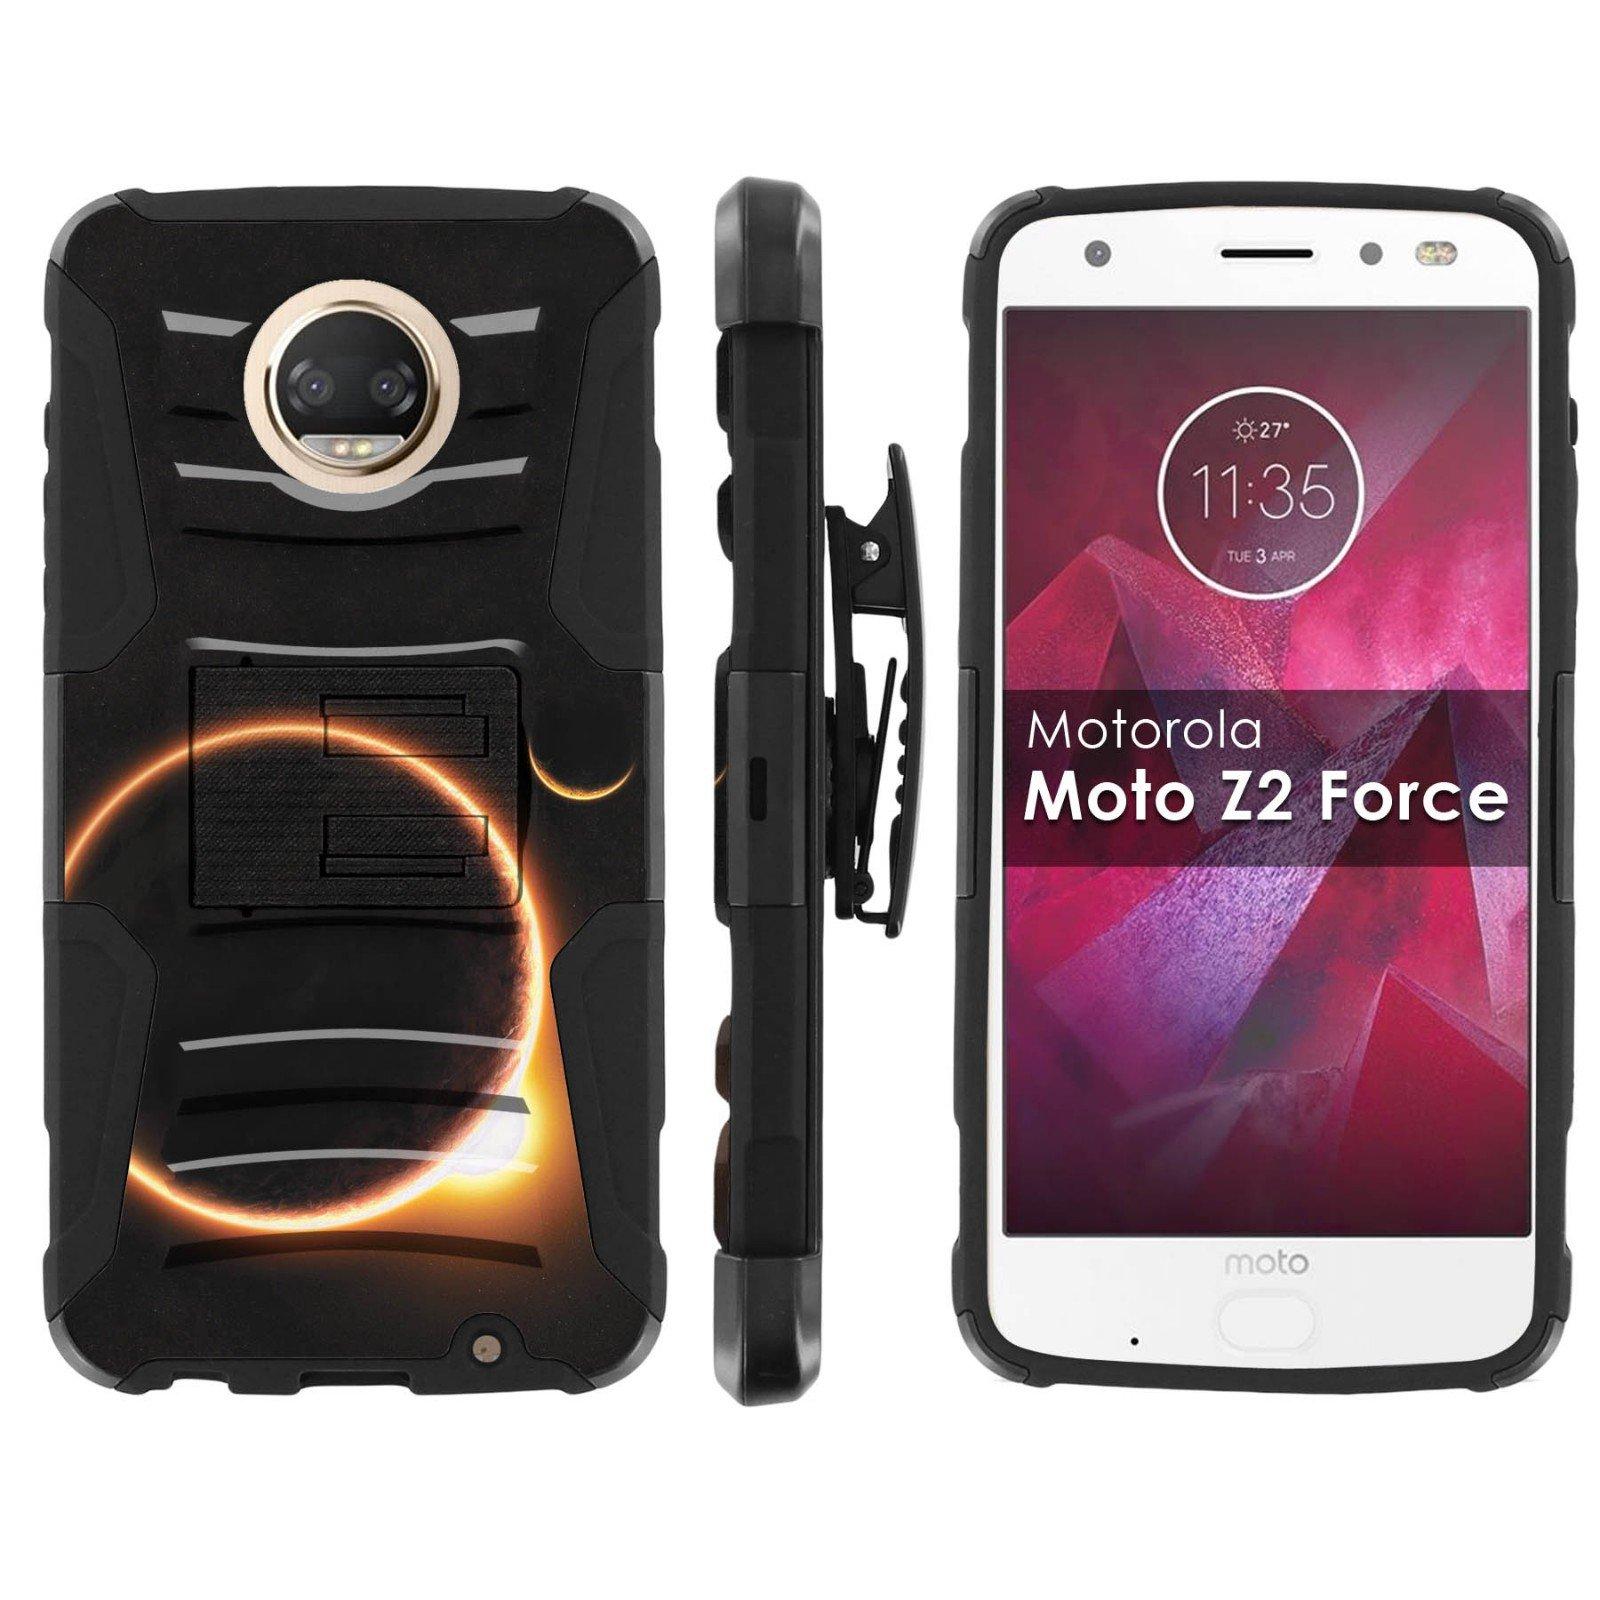 [Mobiflare] Armor Case for Moto Z Force/Z Play [2nd Generation] [Black/Black] Blitz Armor Phone Case with Holster [Moto Z2 Force] [Moto Z2 Play]- [Solar Eclipse]